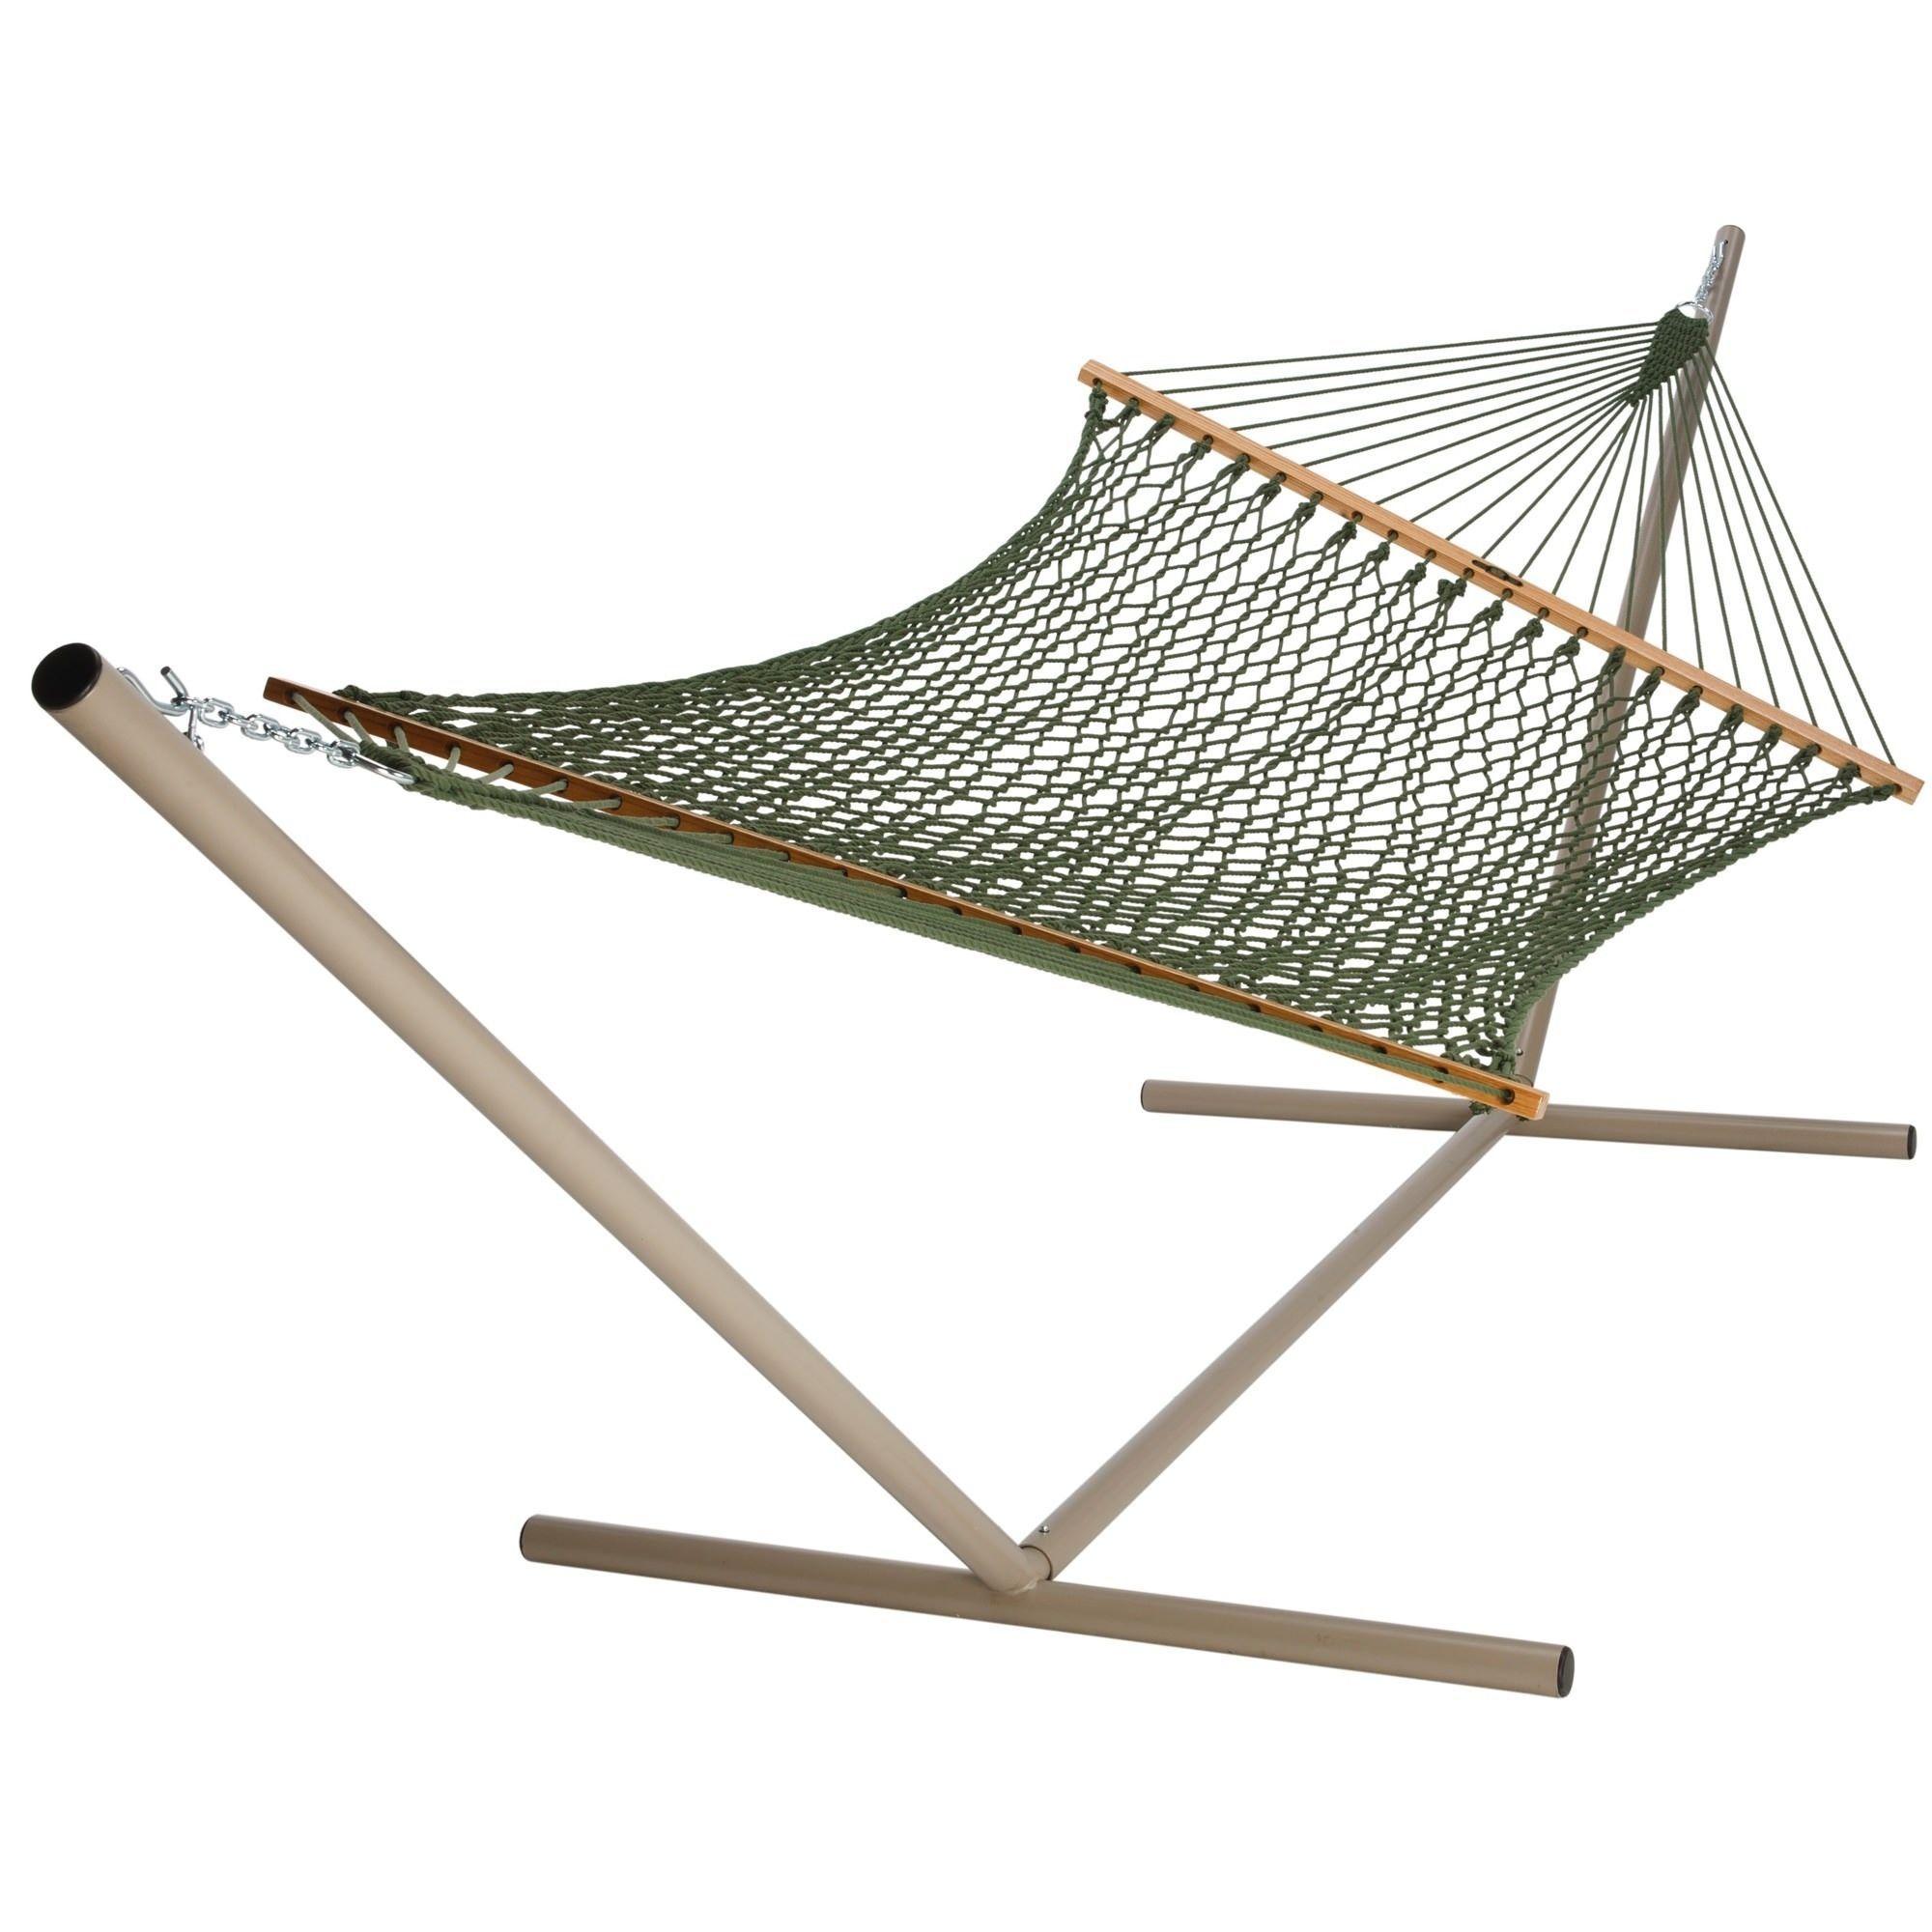 hammock from cpy canopy stand poles coated pawleys pawley w hms island wb powder